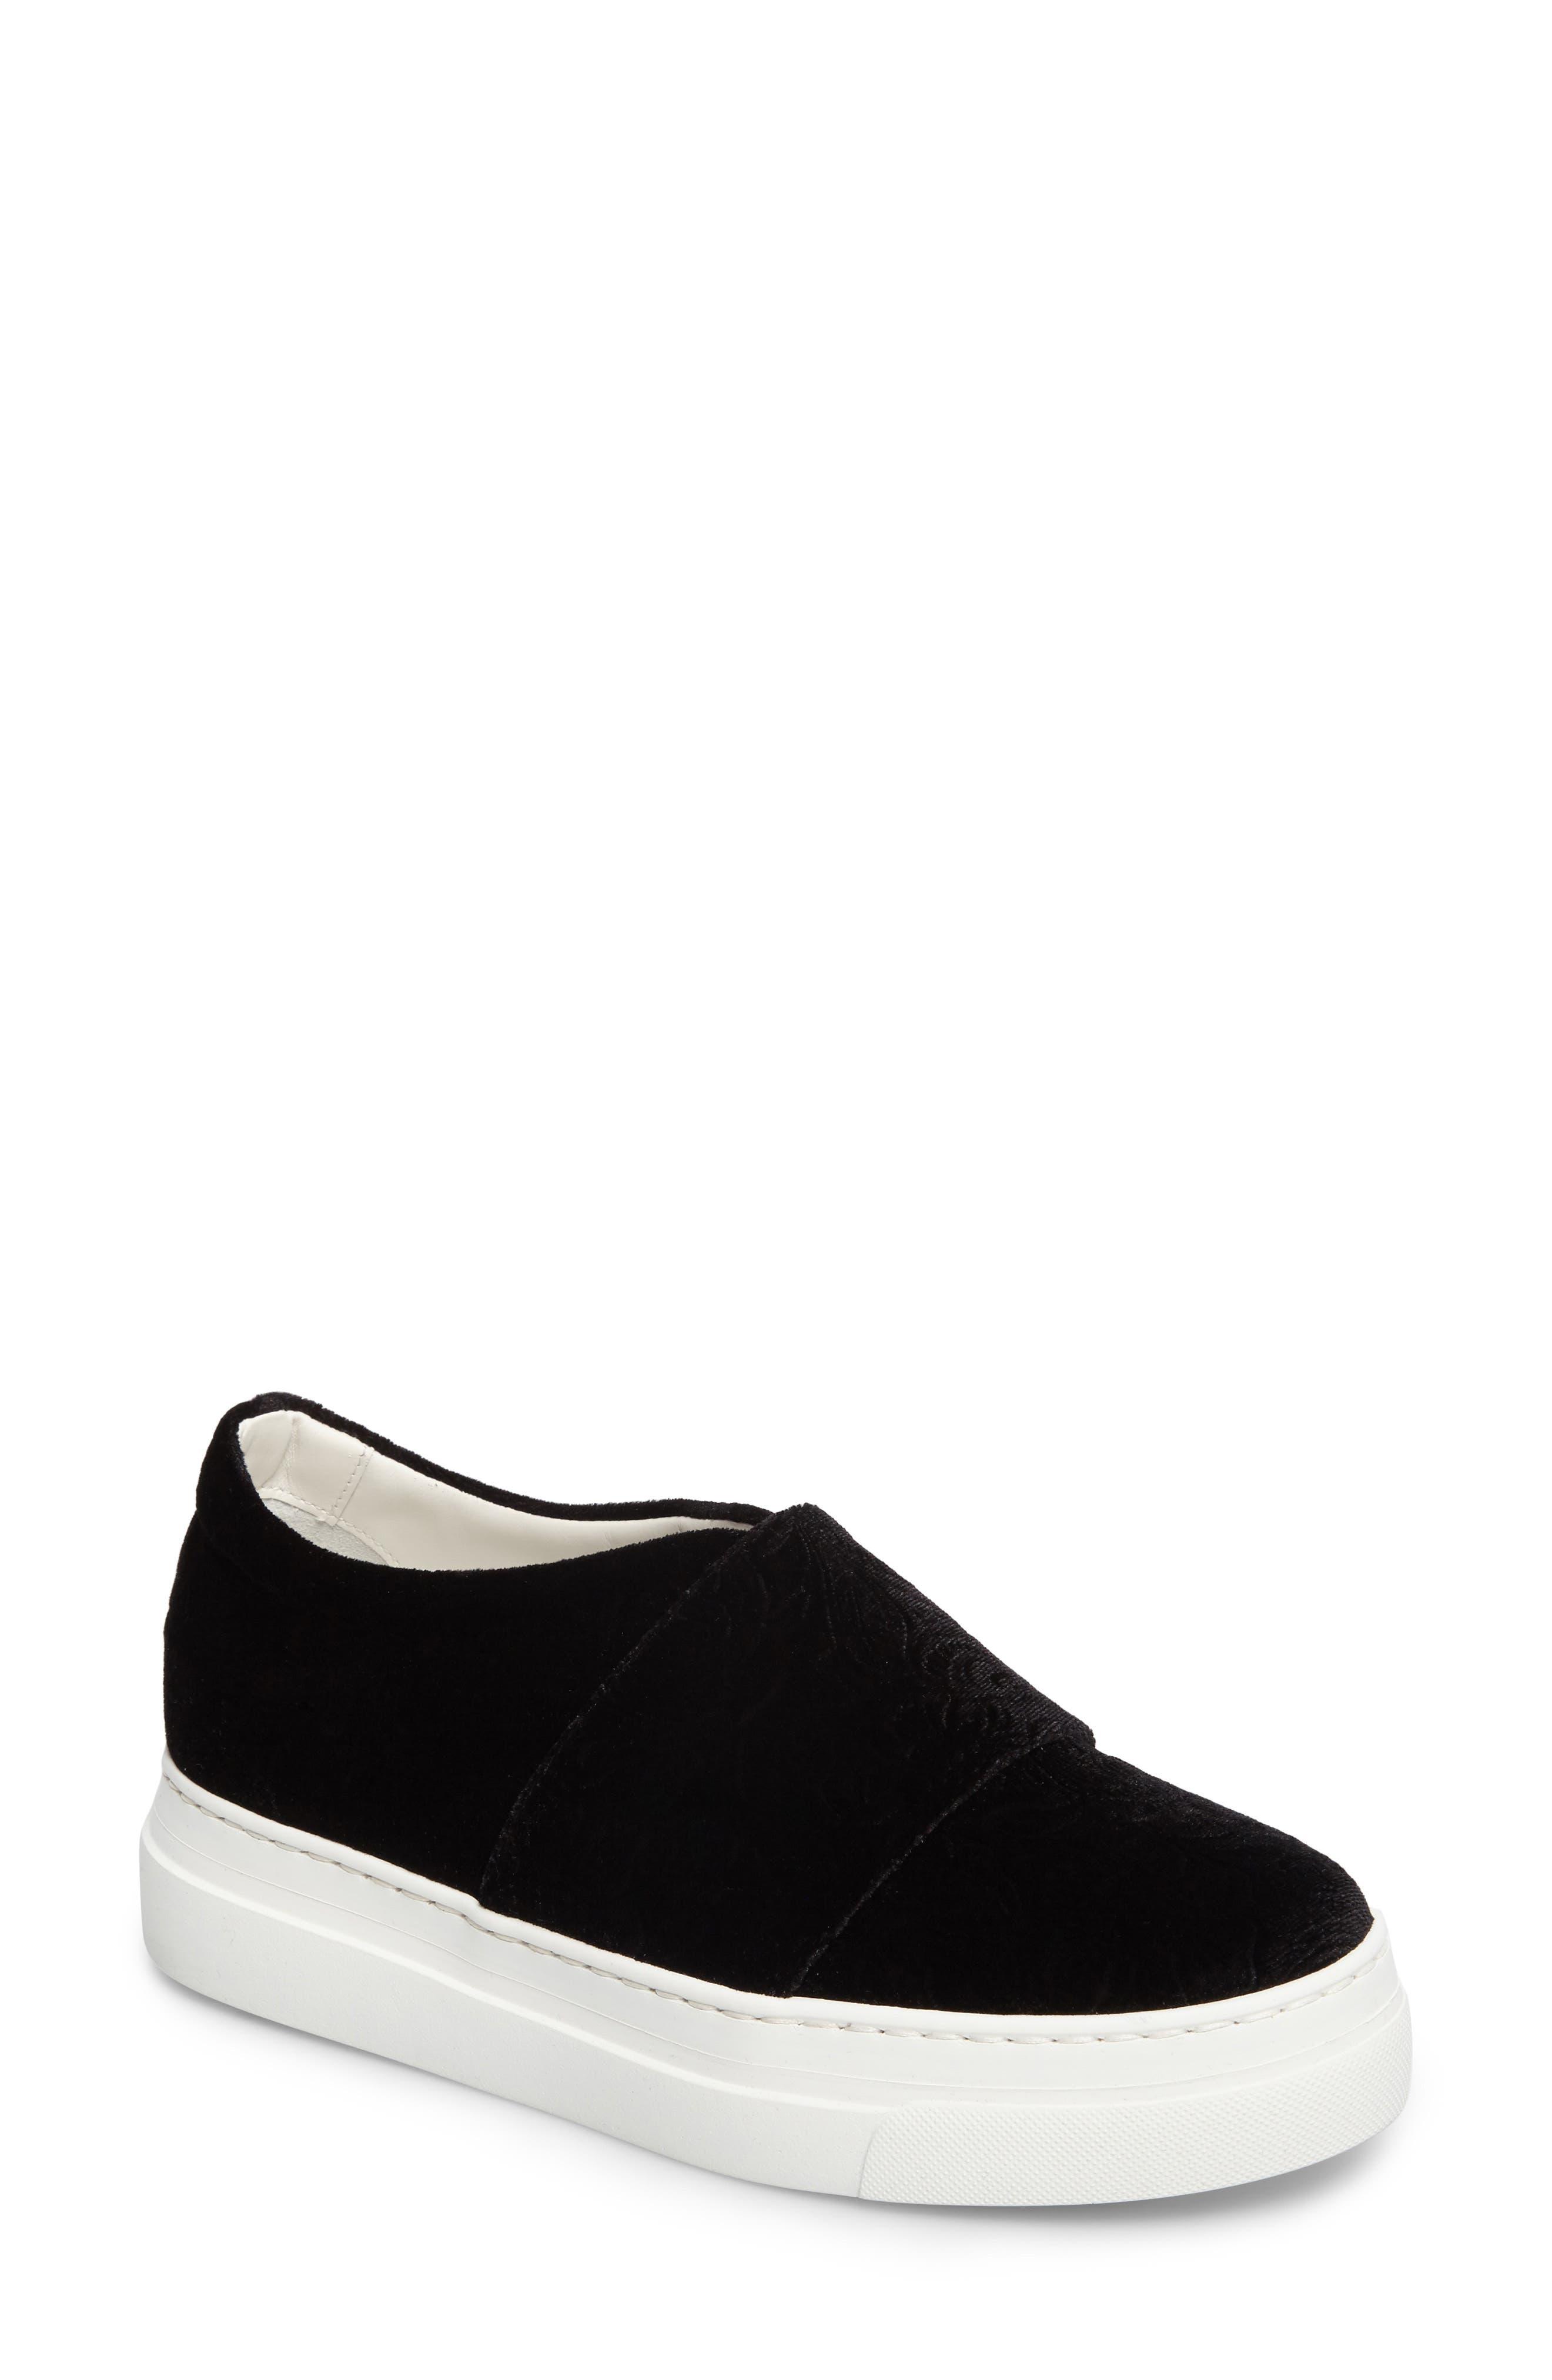 Main Image - Lewit Arlo Slip-On Platform Sneaker (Women)